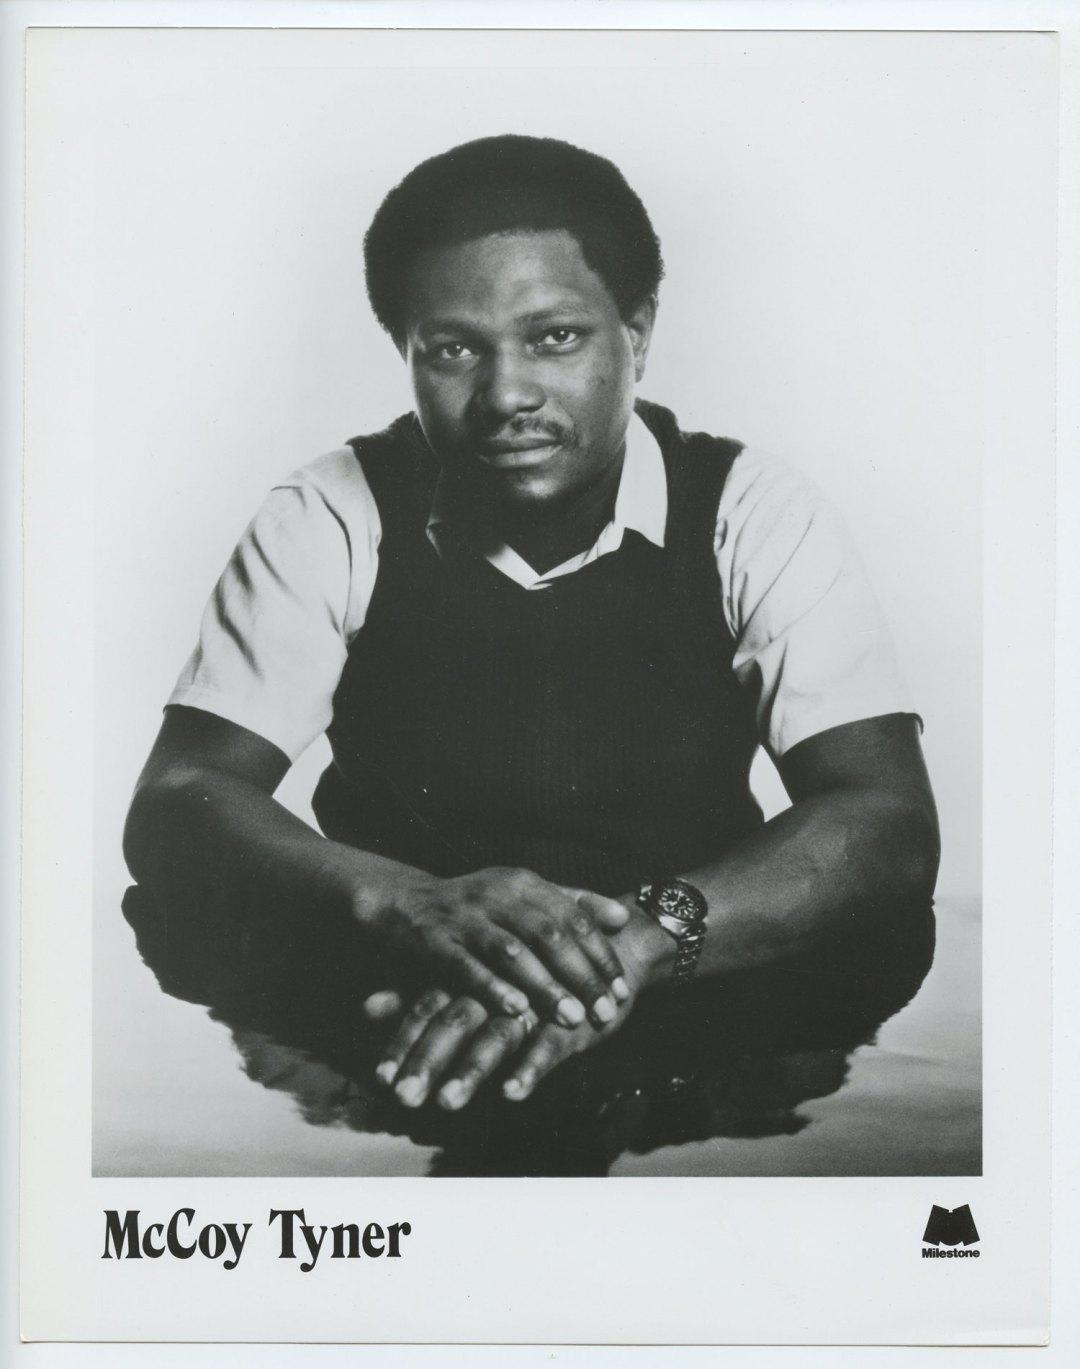 McCoy Tyner Photo Milestone Records 1975 Original Vintage